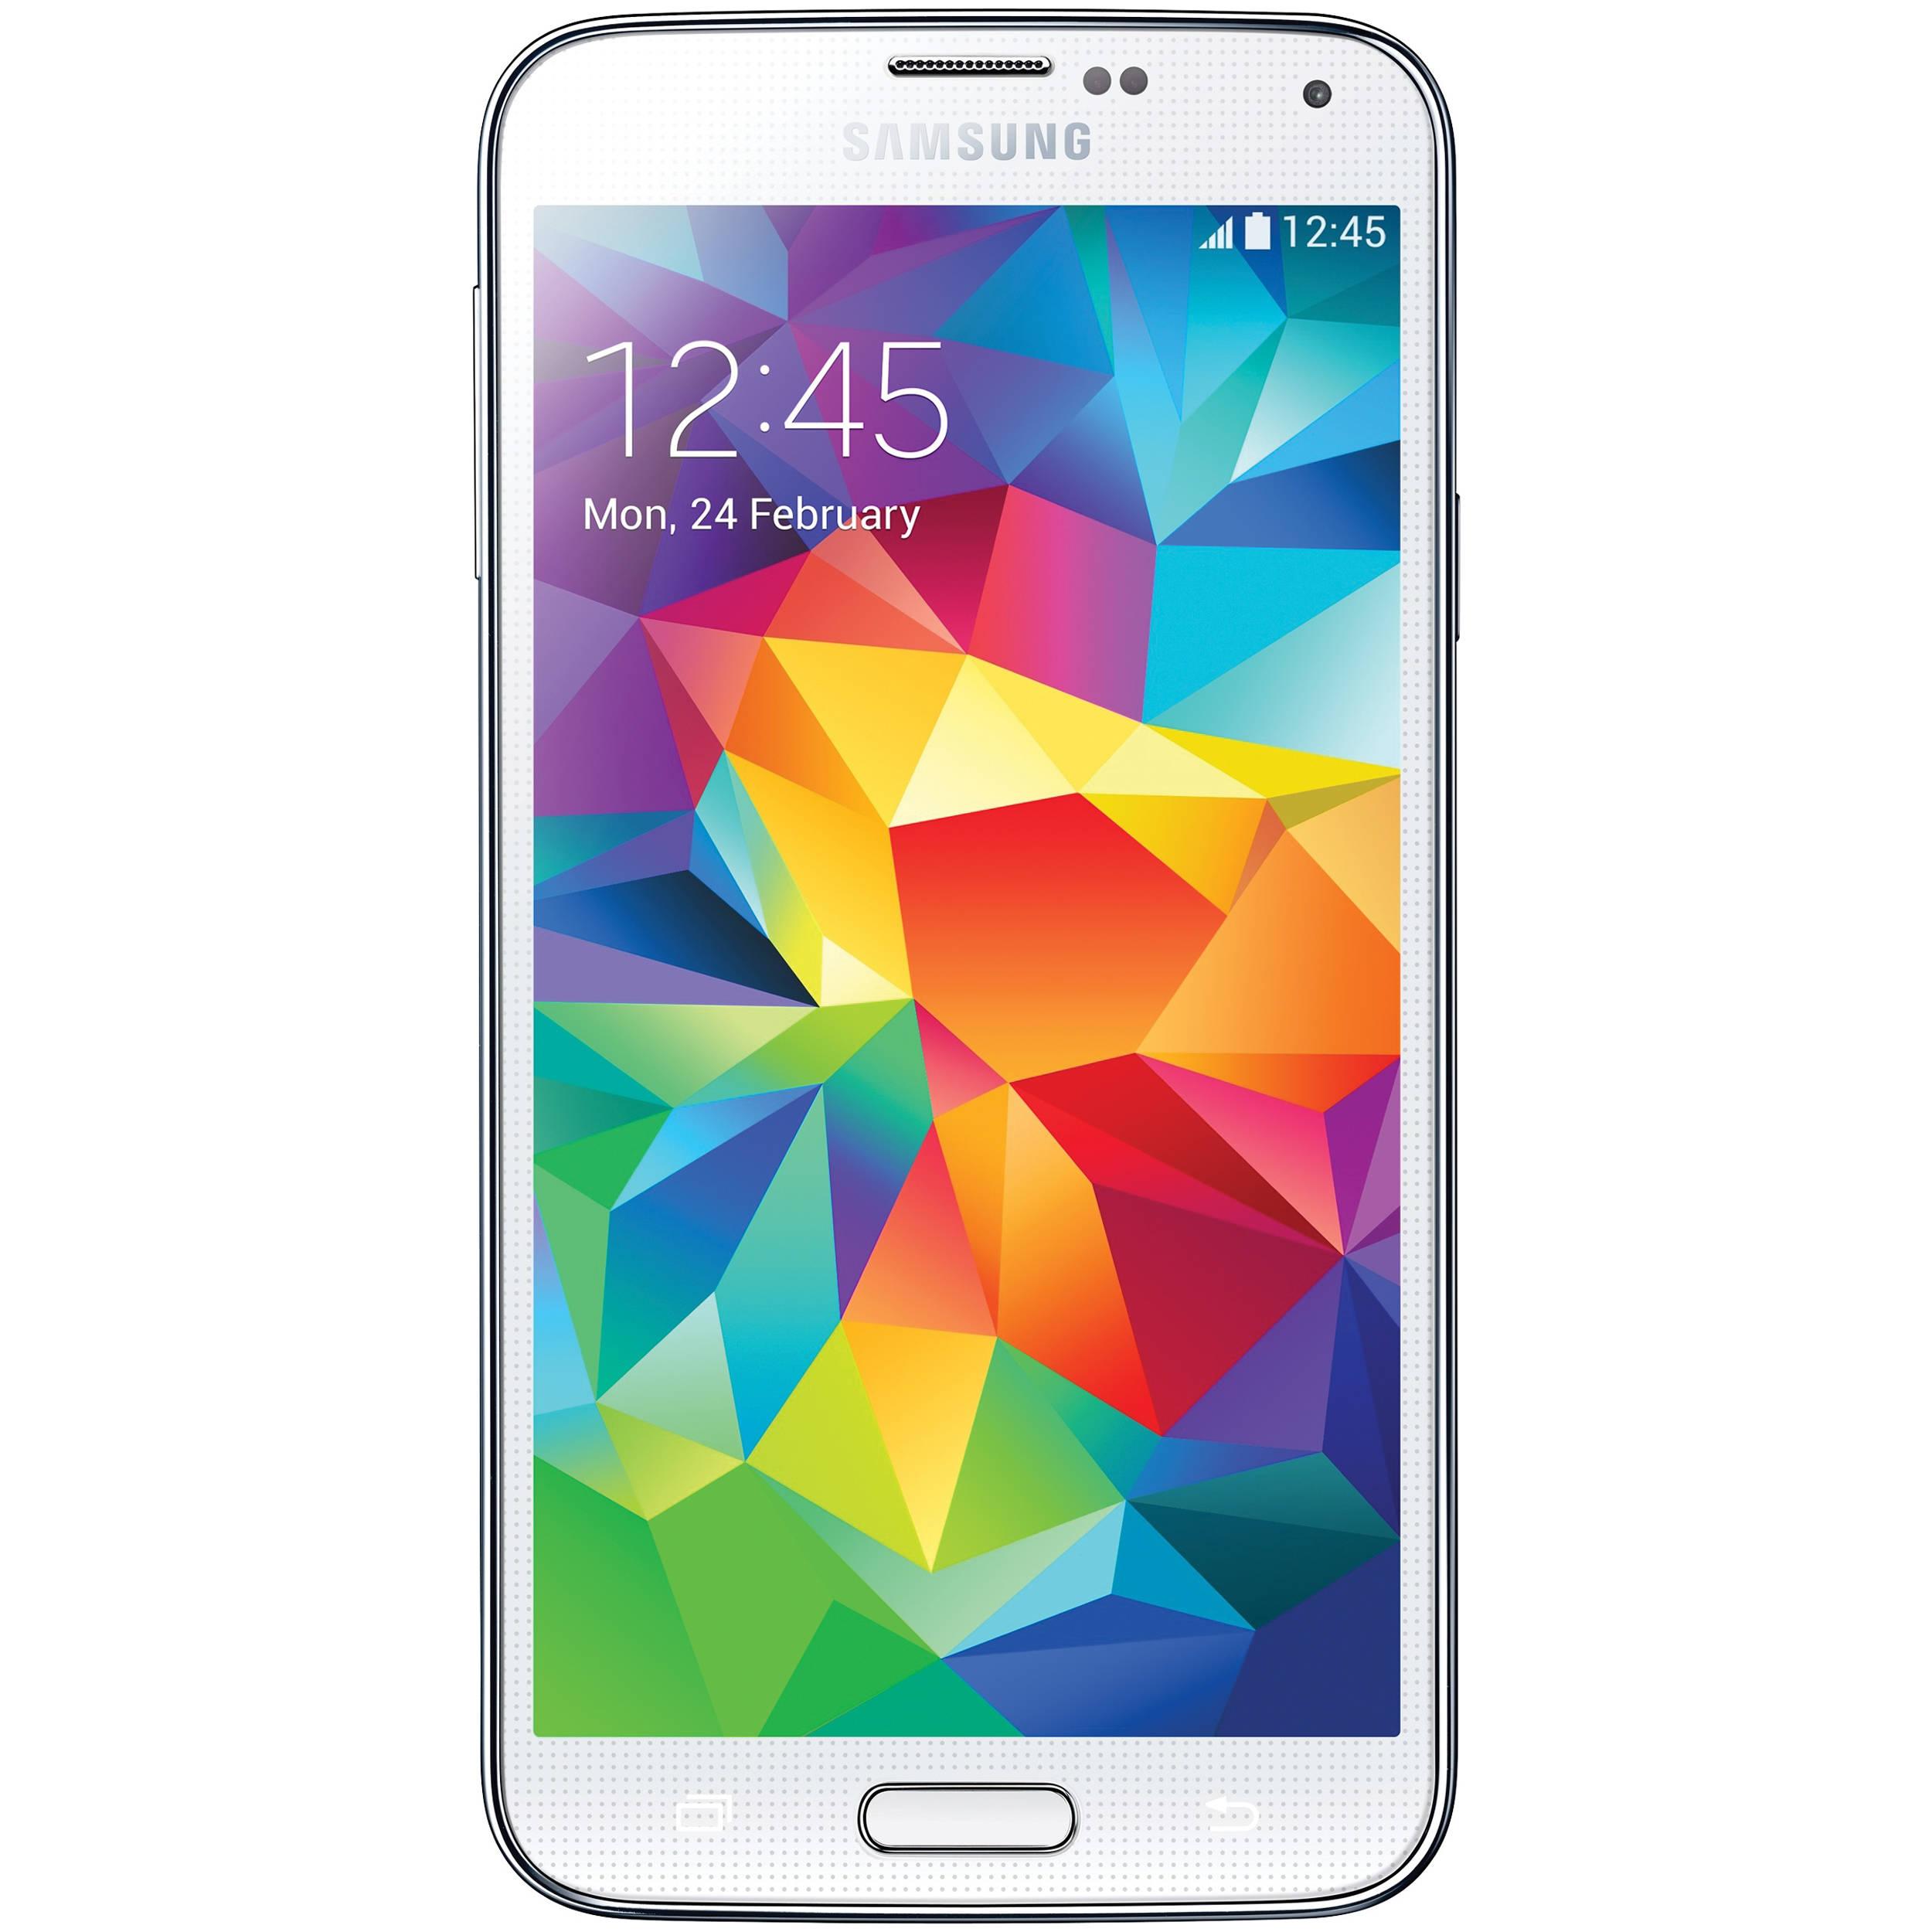 samsung galaxy s5 smg900f 16gb smartphone smg900fwhite bamph